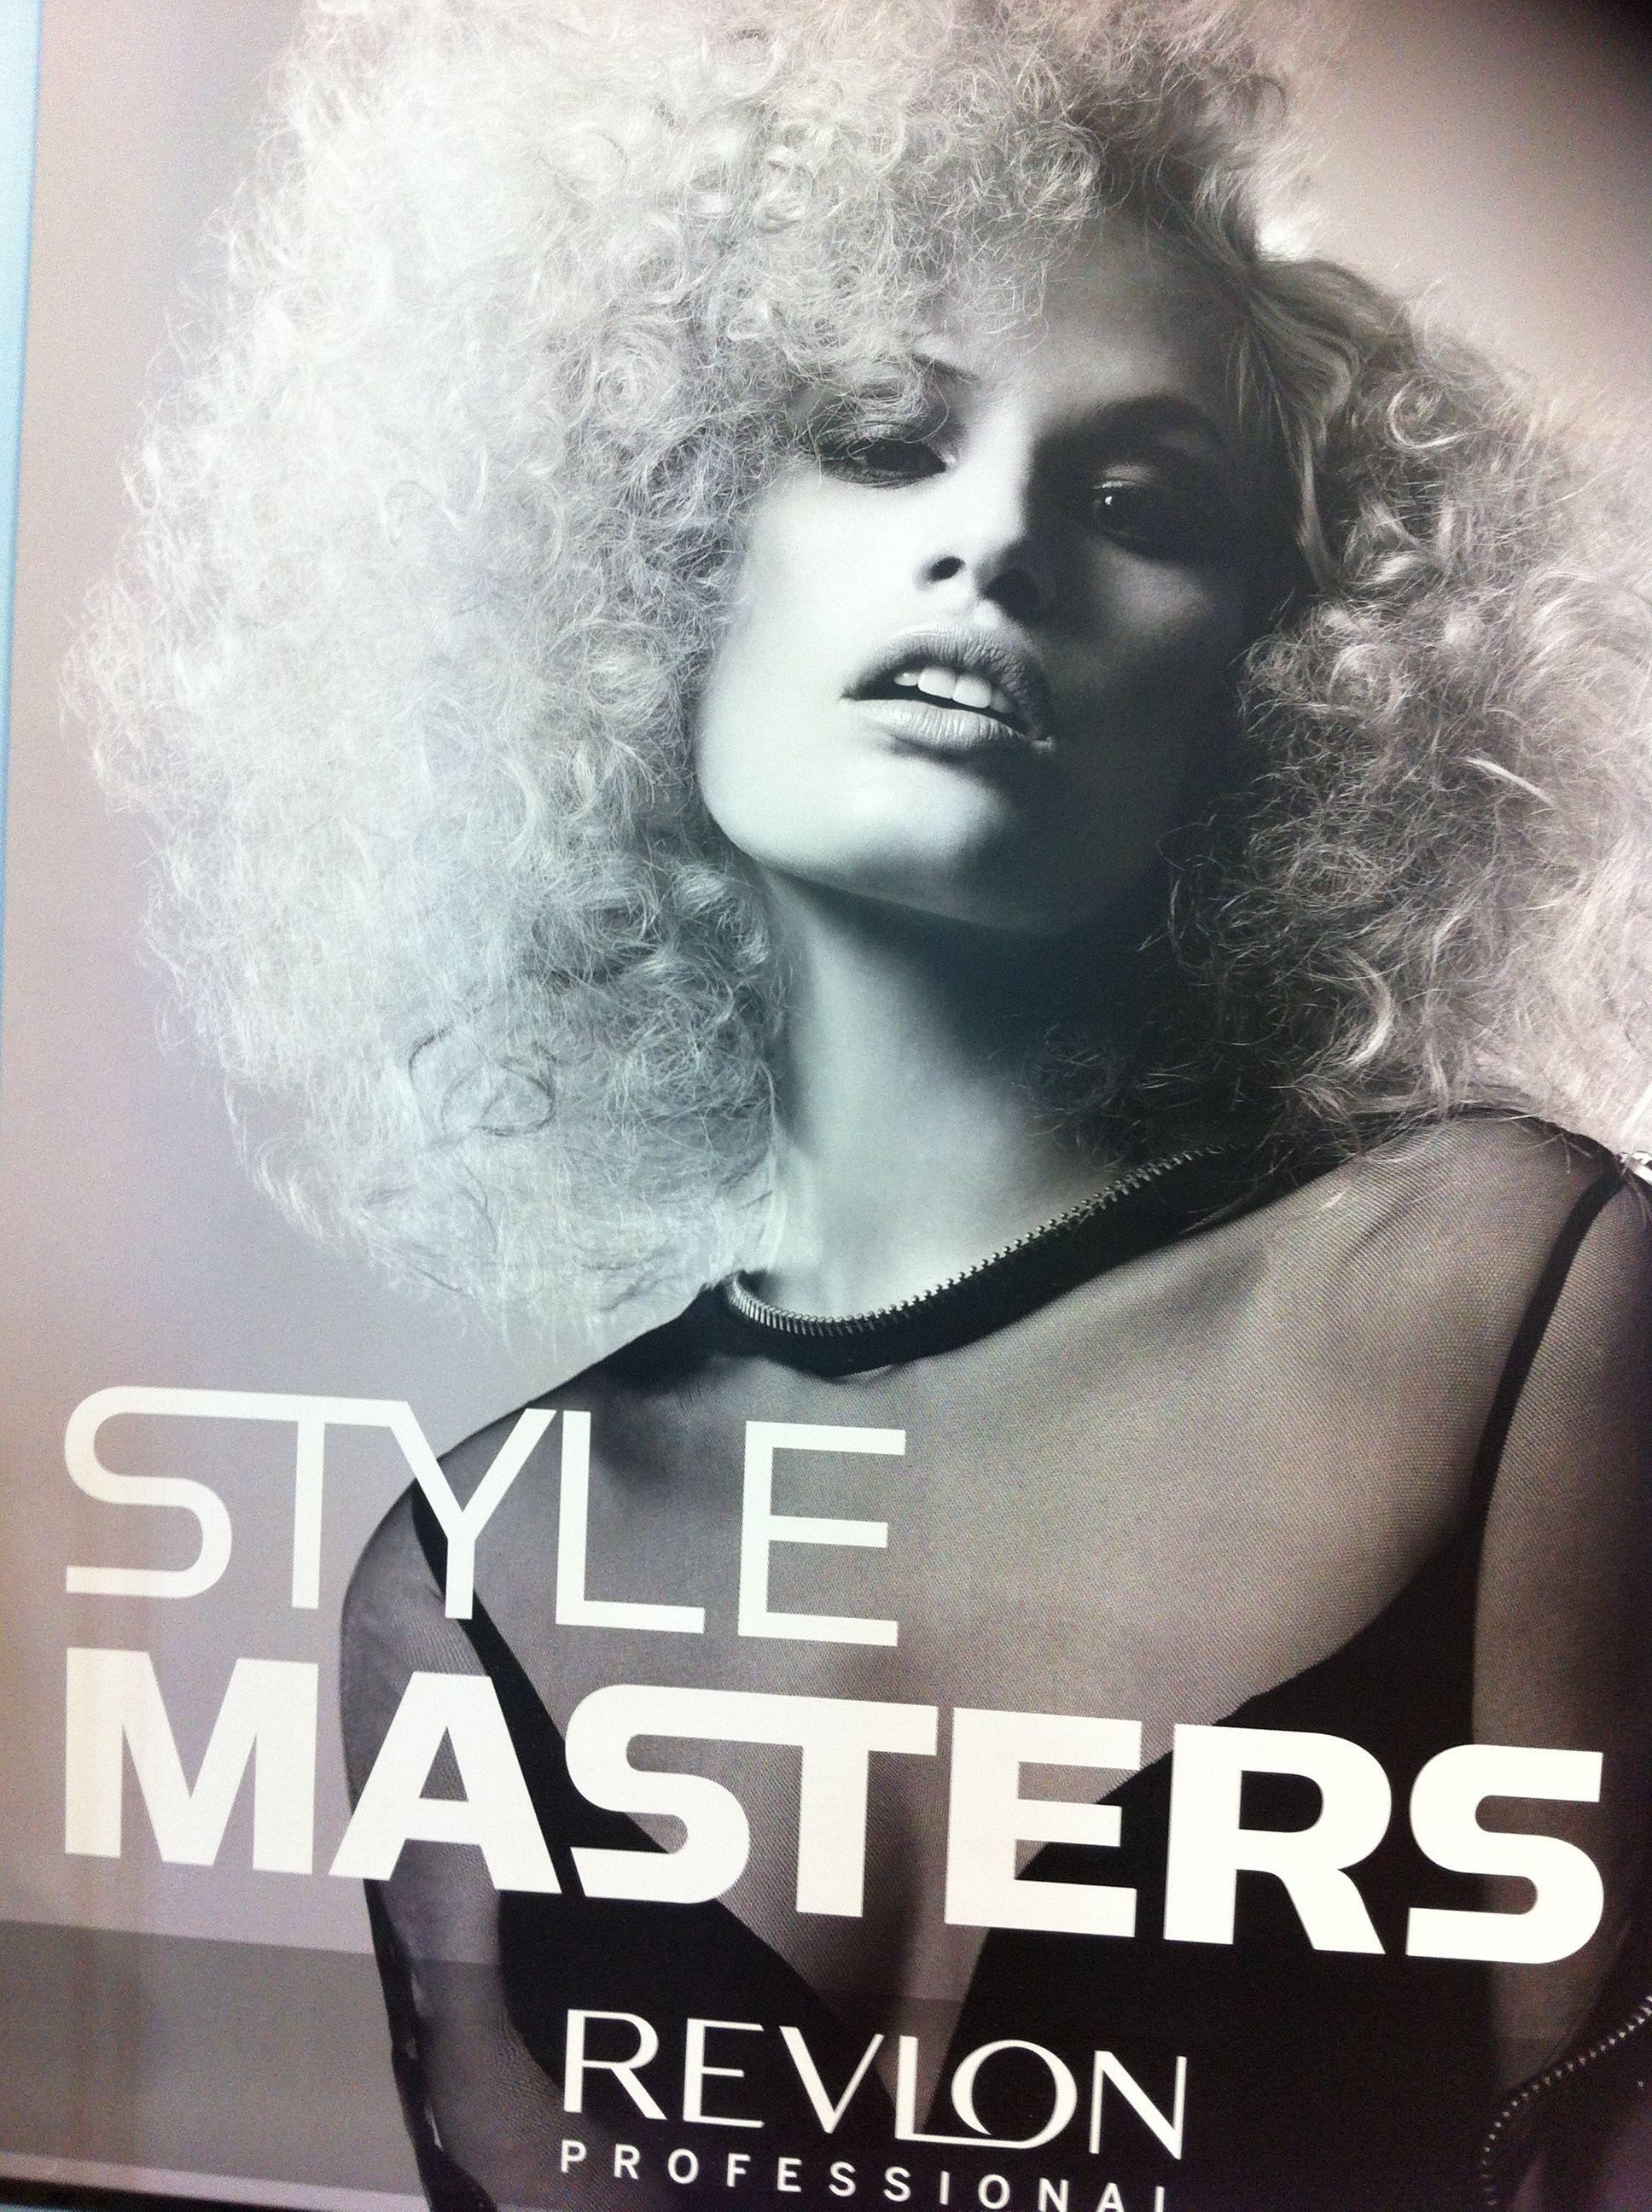 Style Master